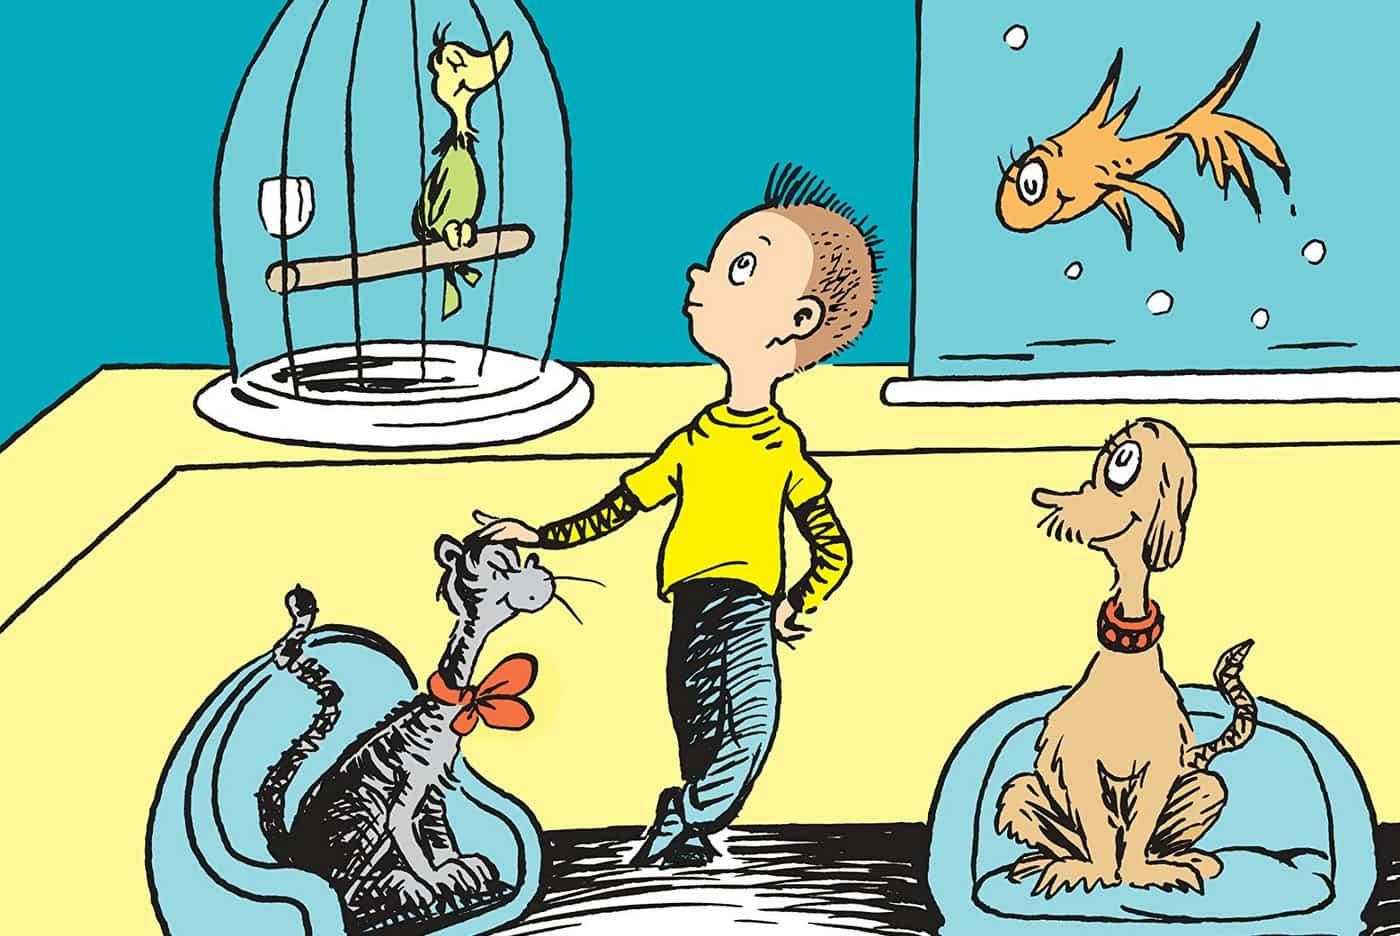 What Pet Should I Get - Dr Seuss